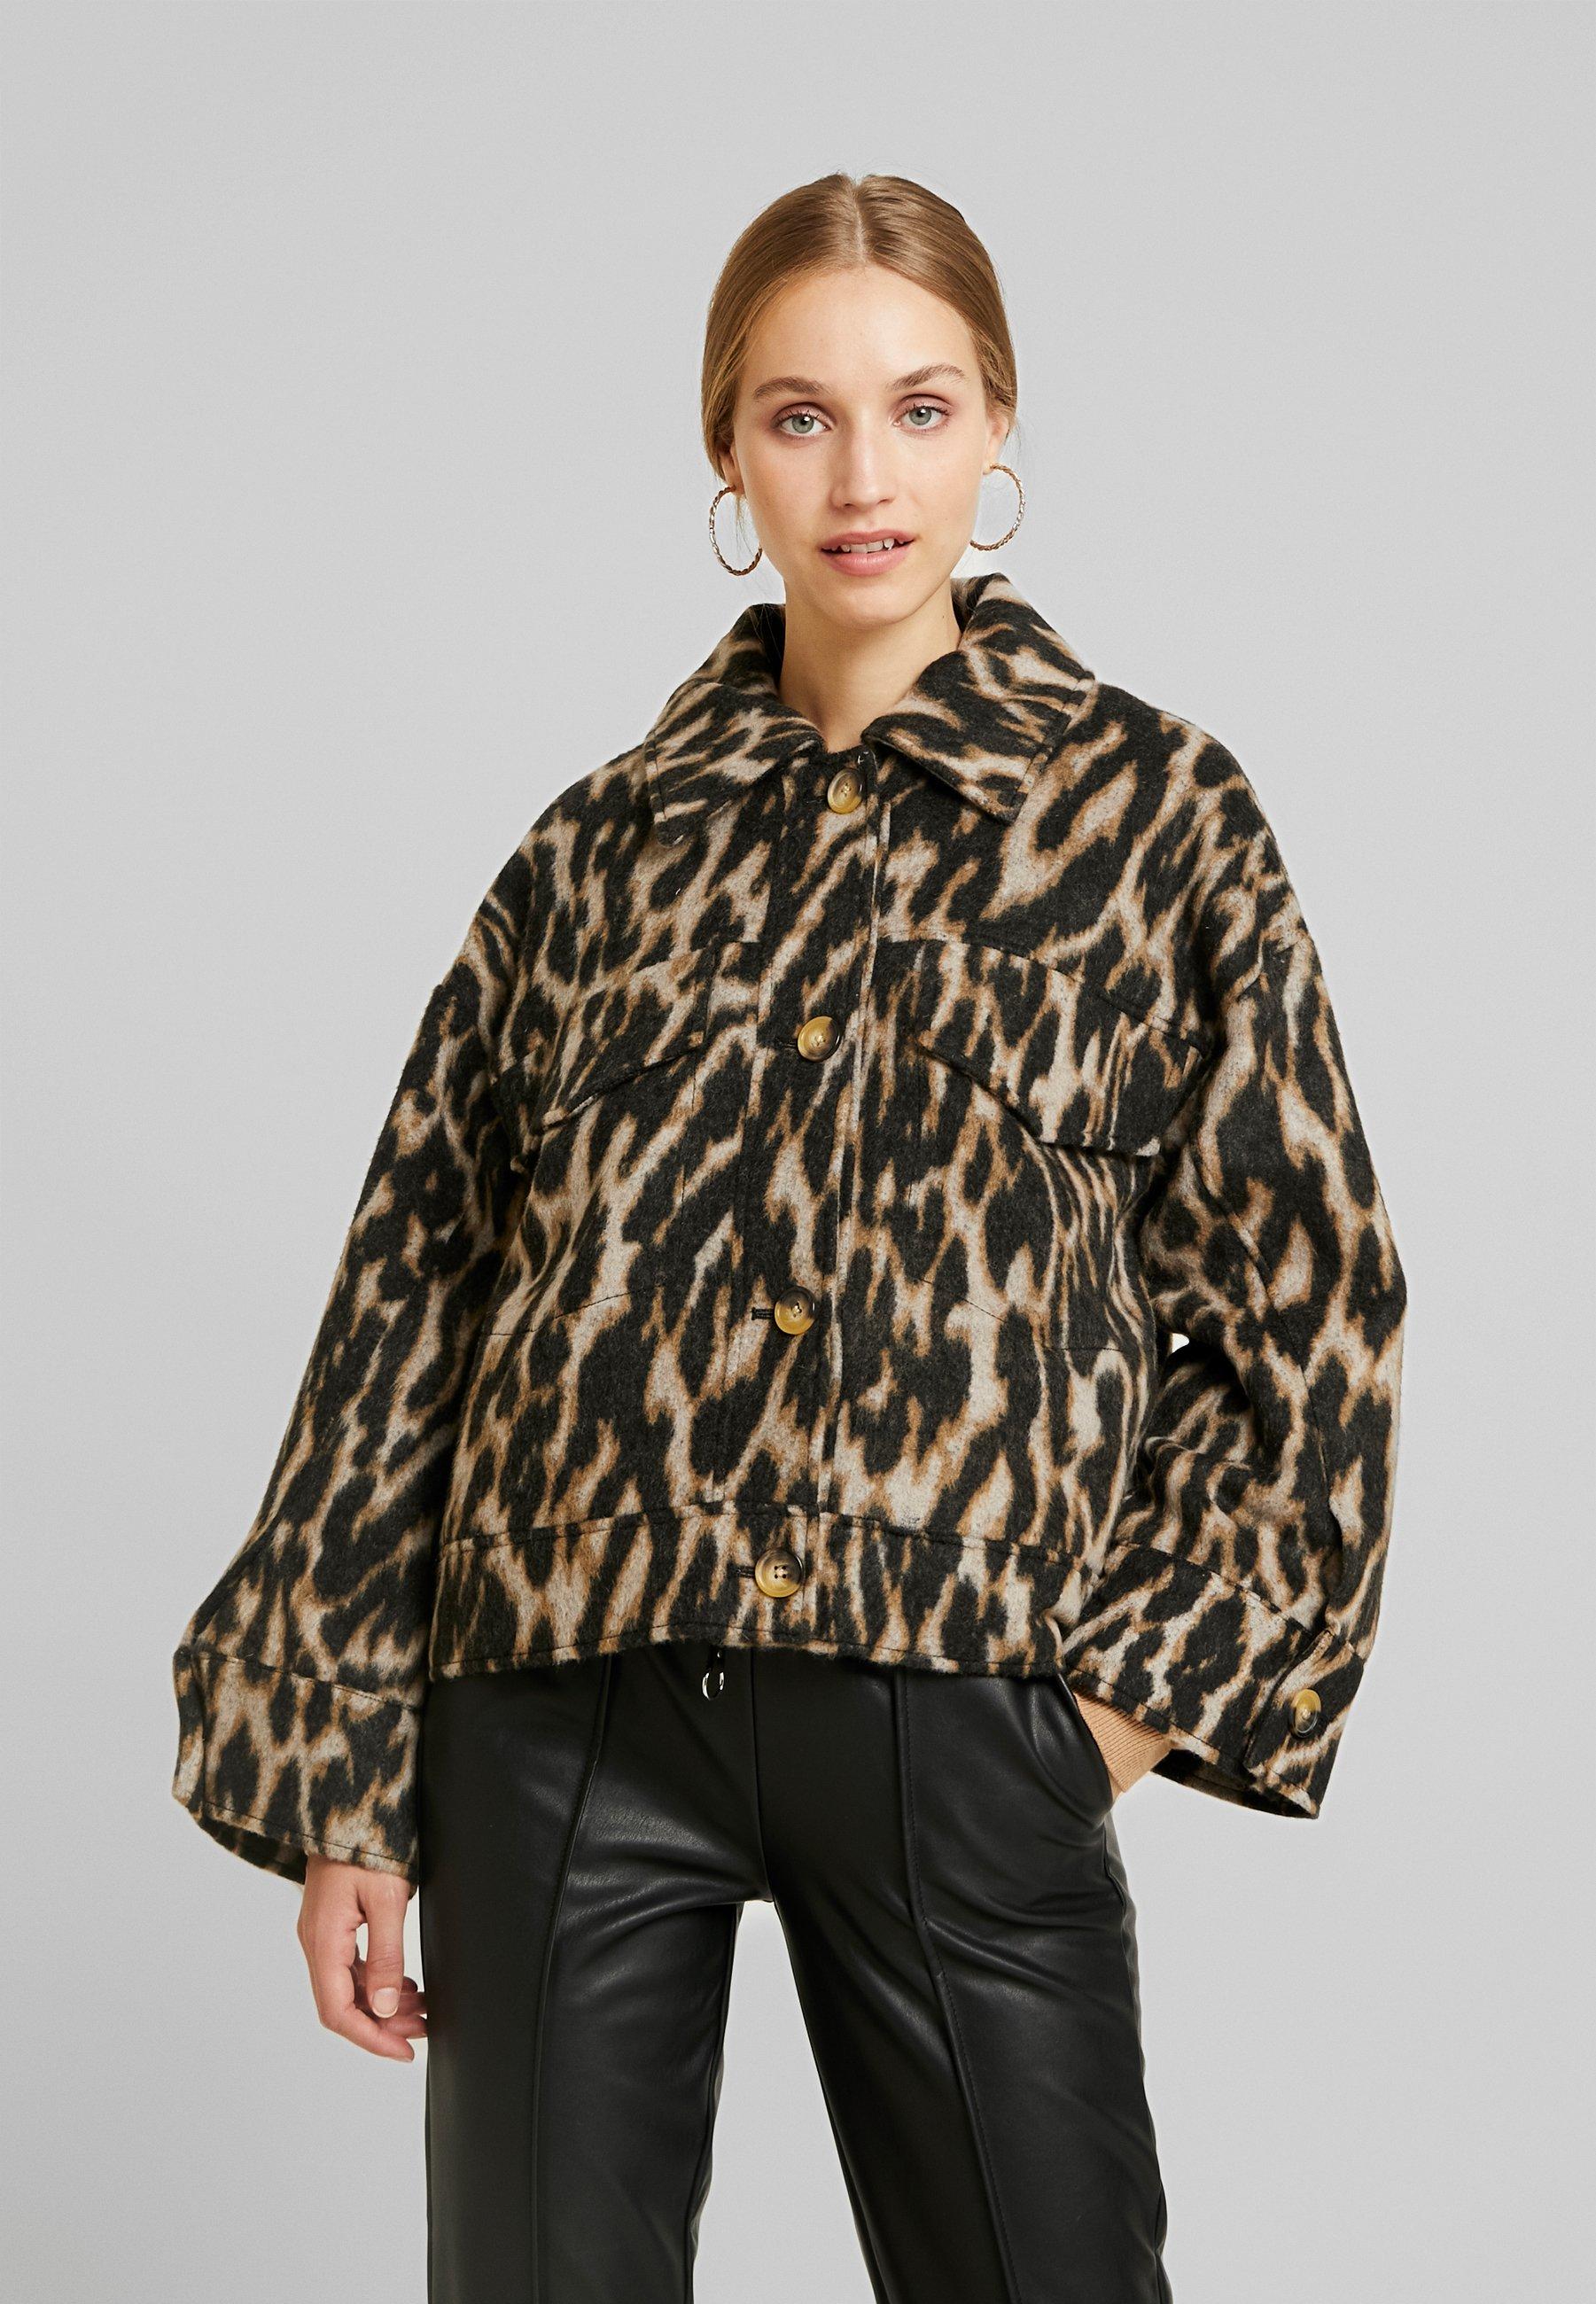 JetheVeste Soaked D'hiver Brown In Luxury 0wOnPk8